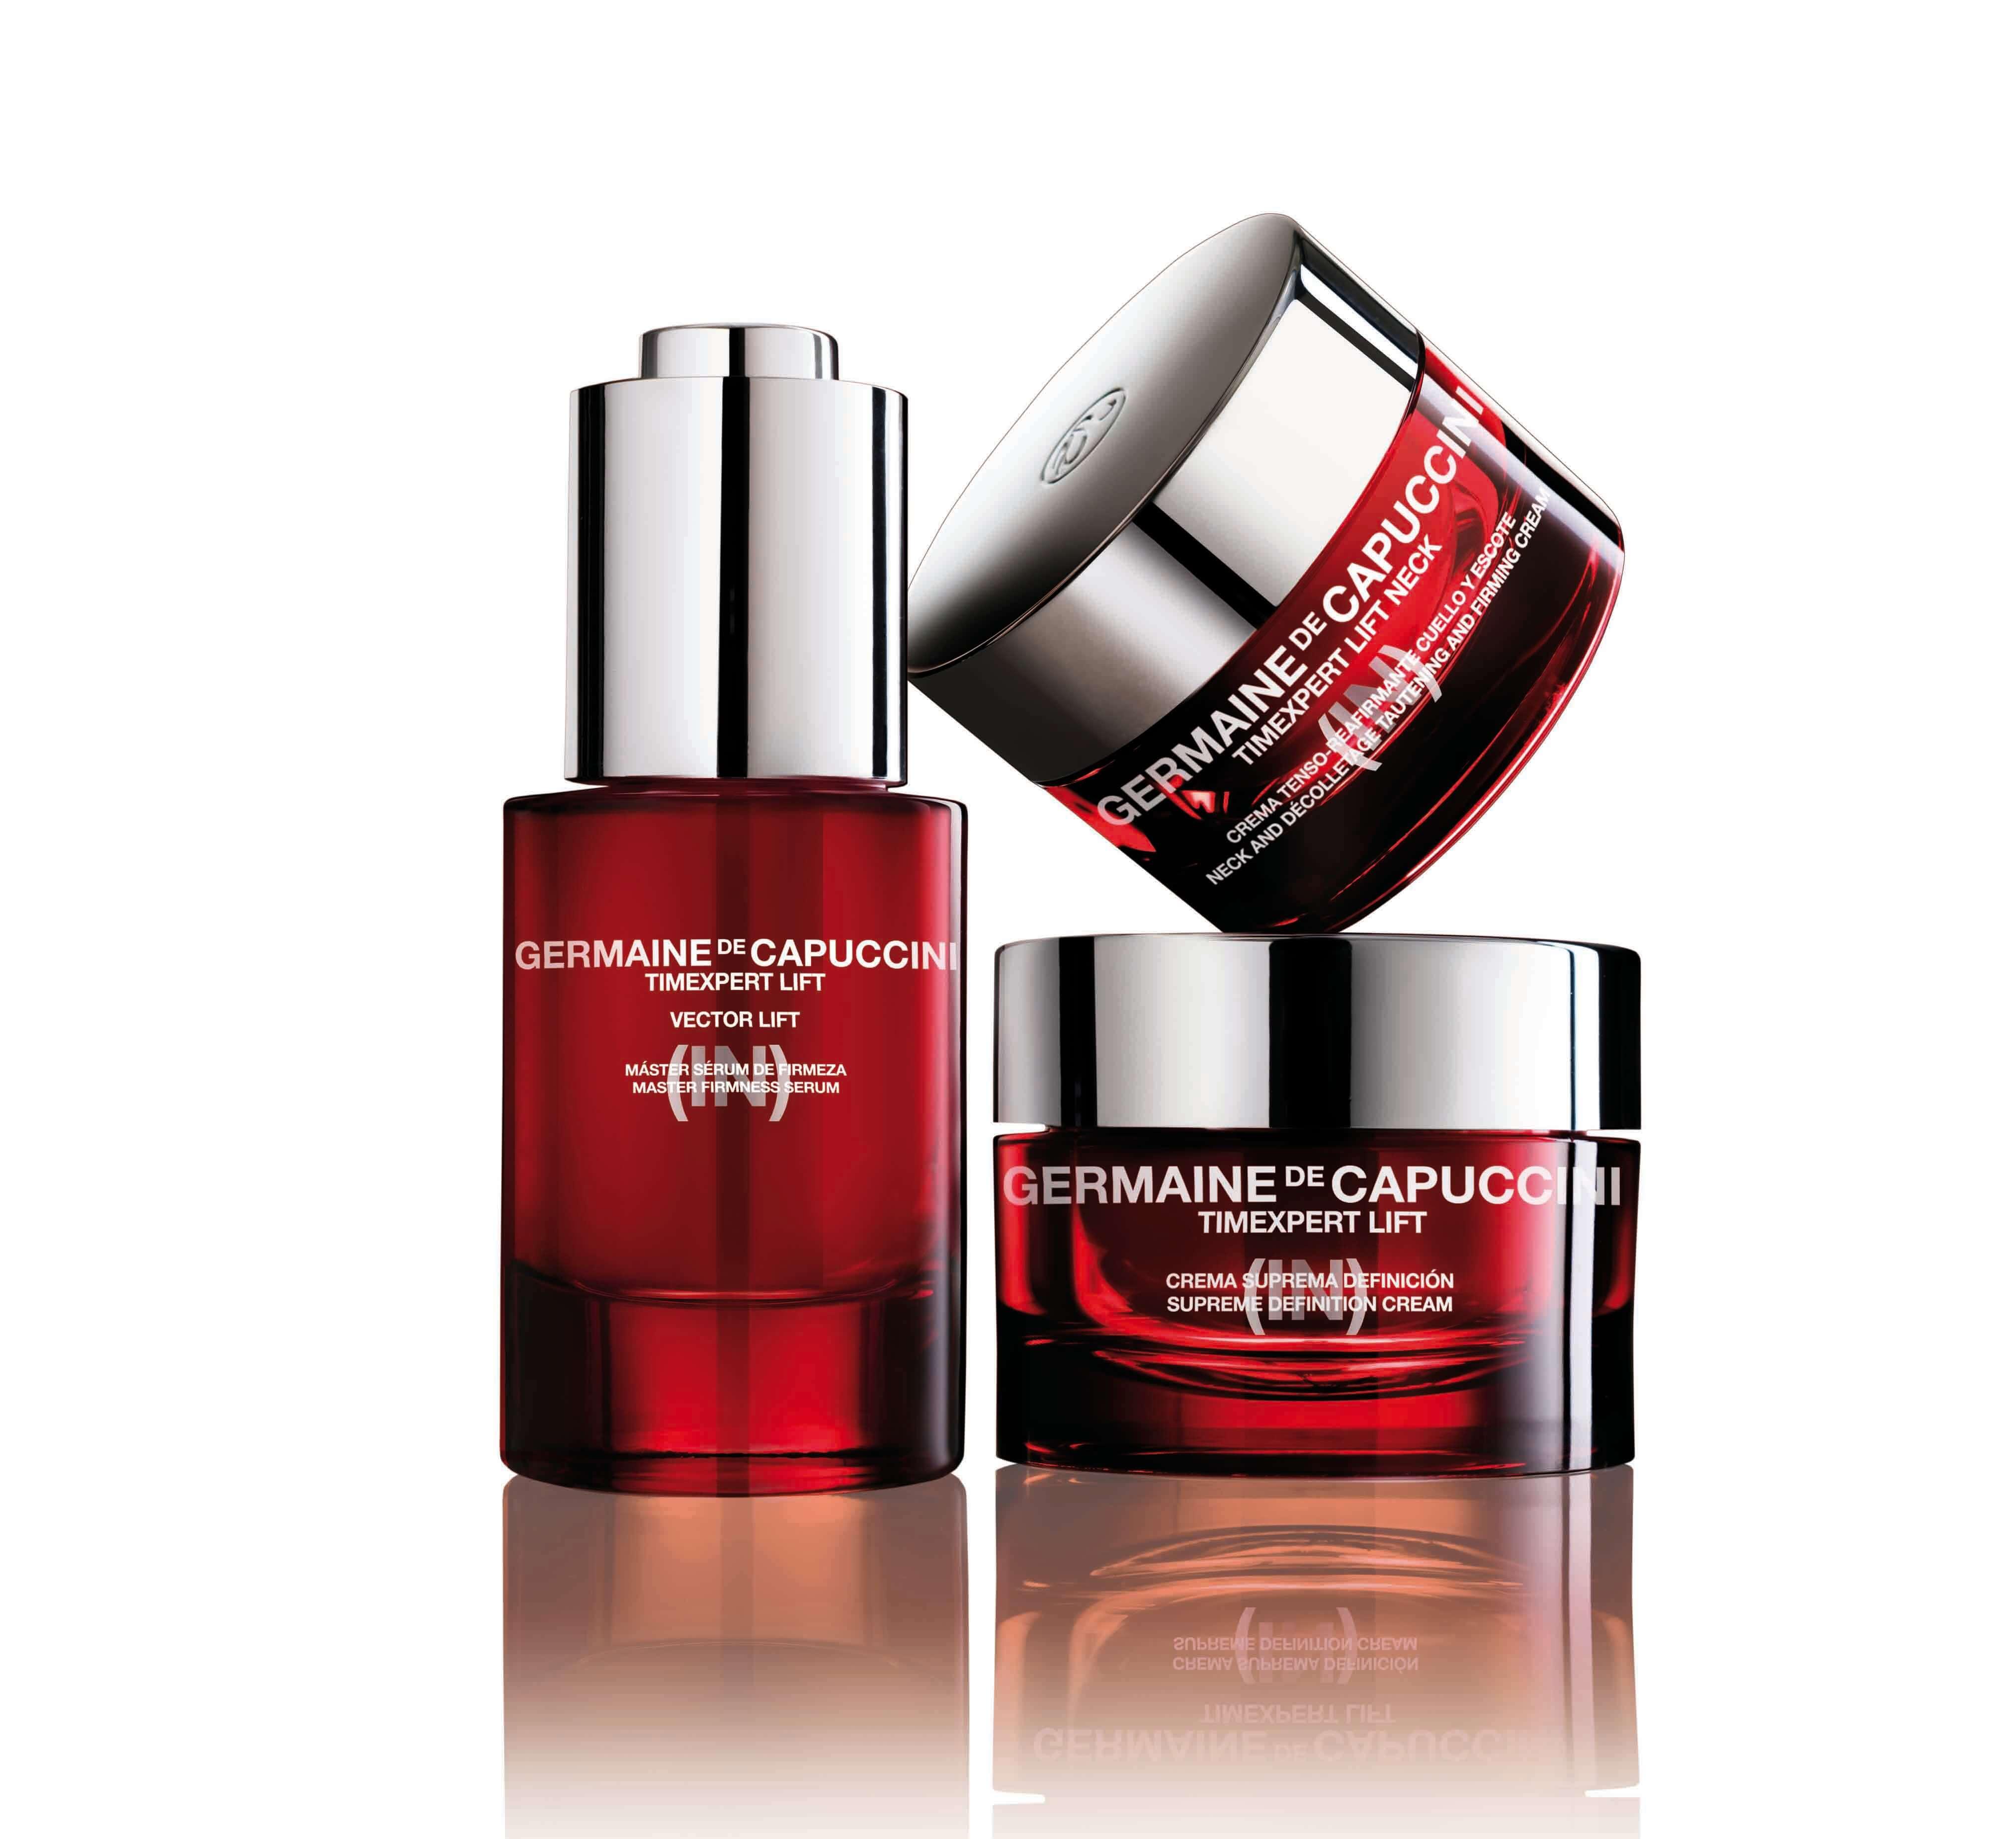 Germaine De Cappuccini Time Expert Skincare